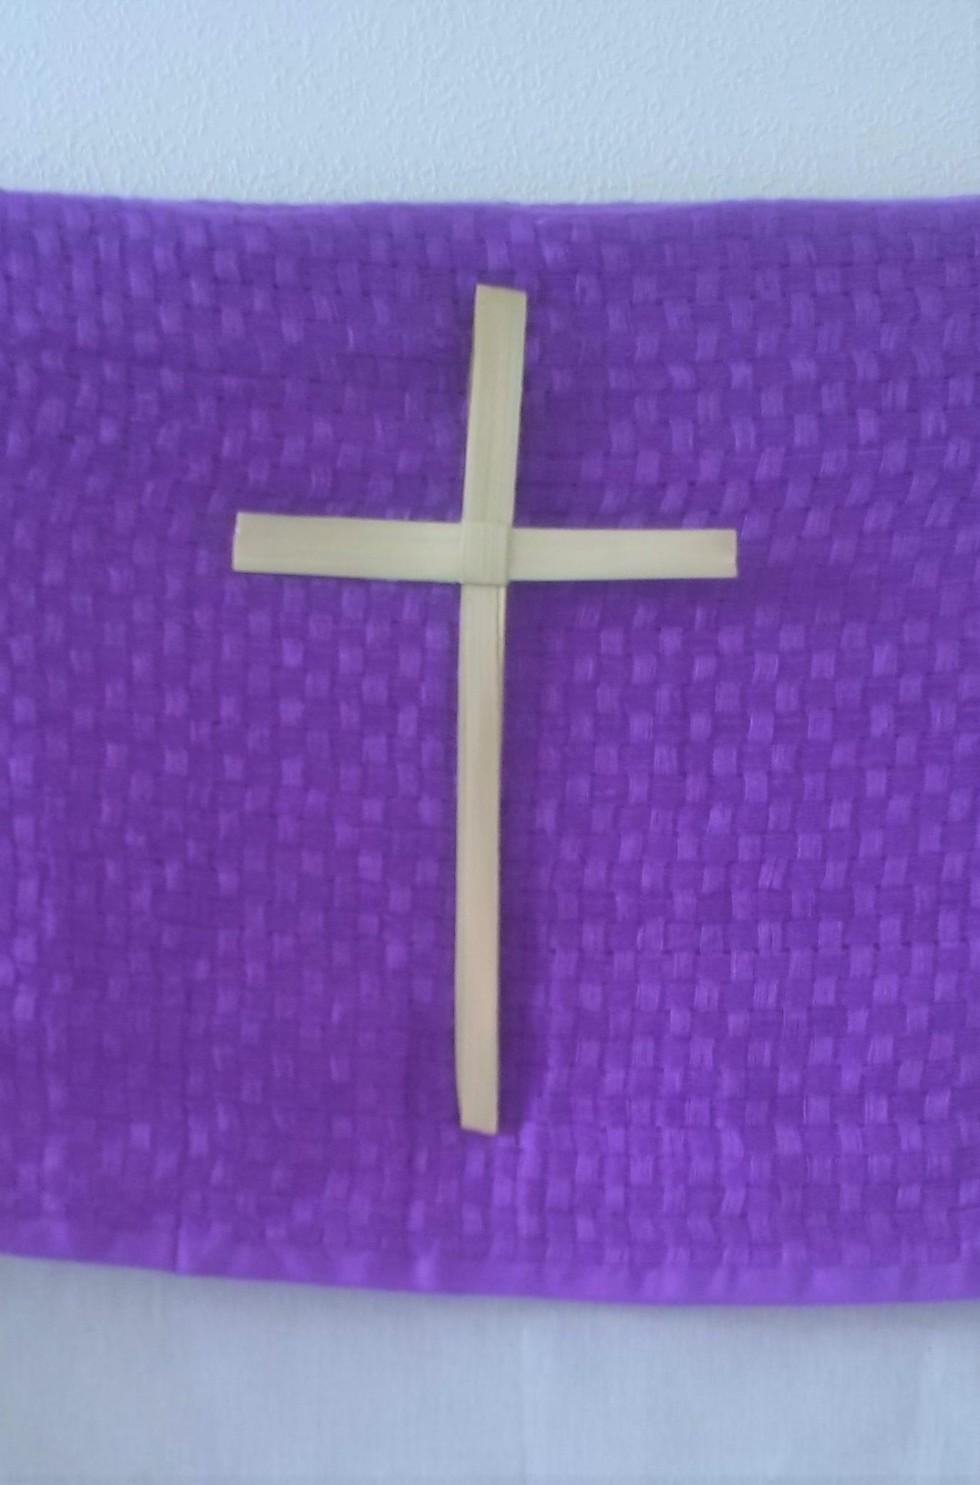 A palm cross